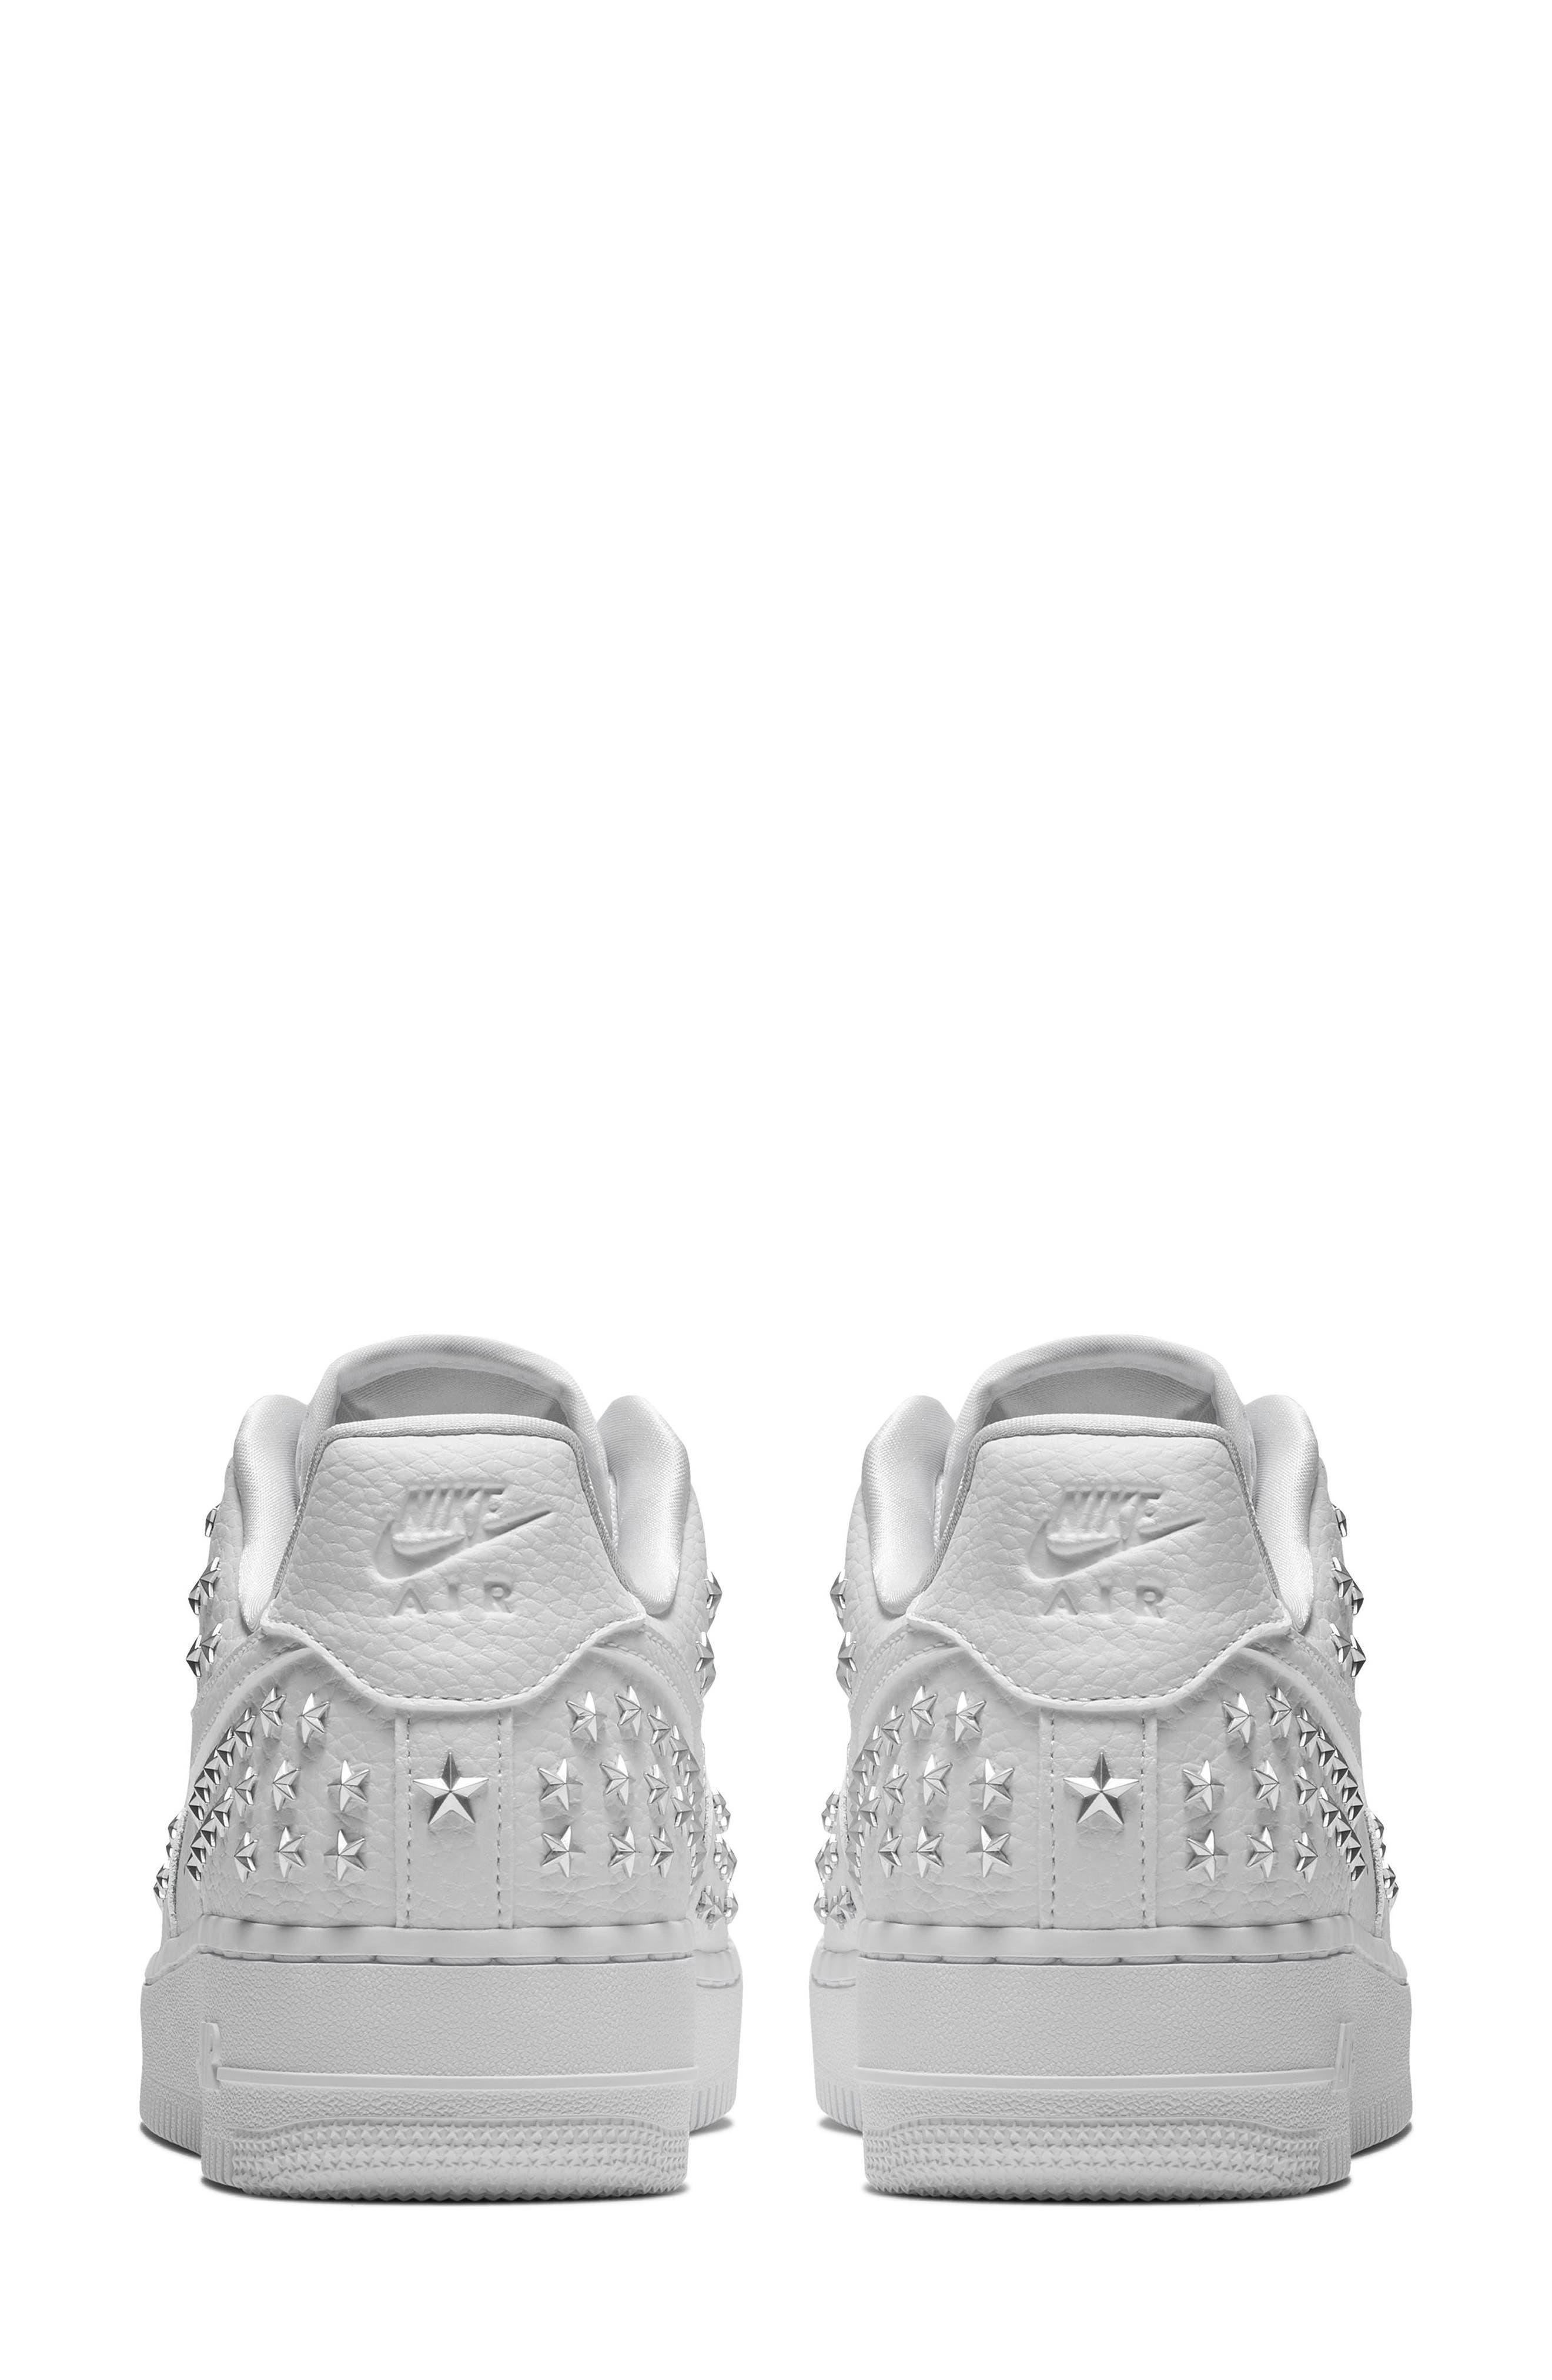 Air Force 1 '07 XX Sneaker,                             Alternate thumbnail 2, color,                             WHITE/ WHITE/ WHITE